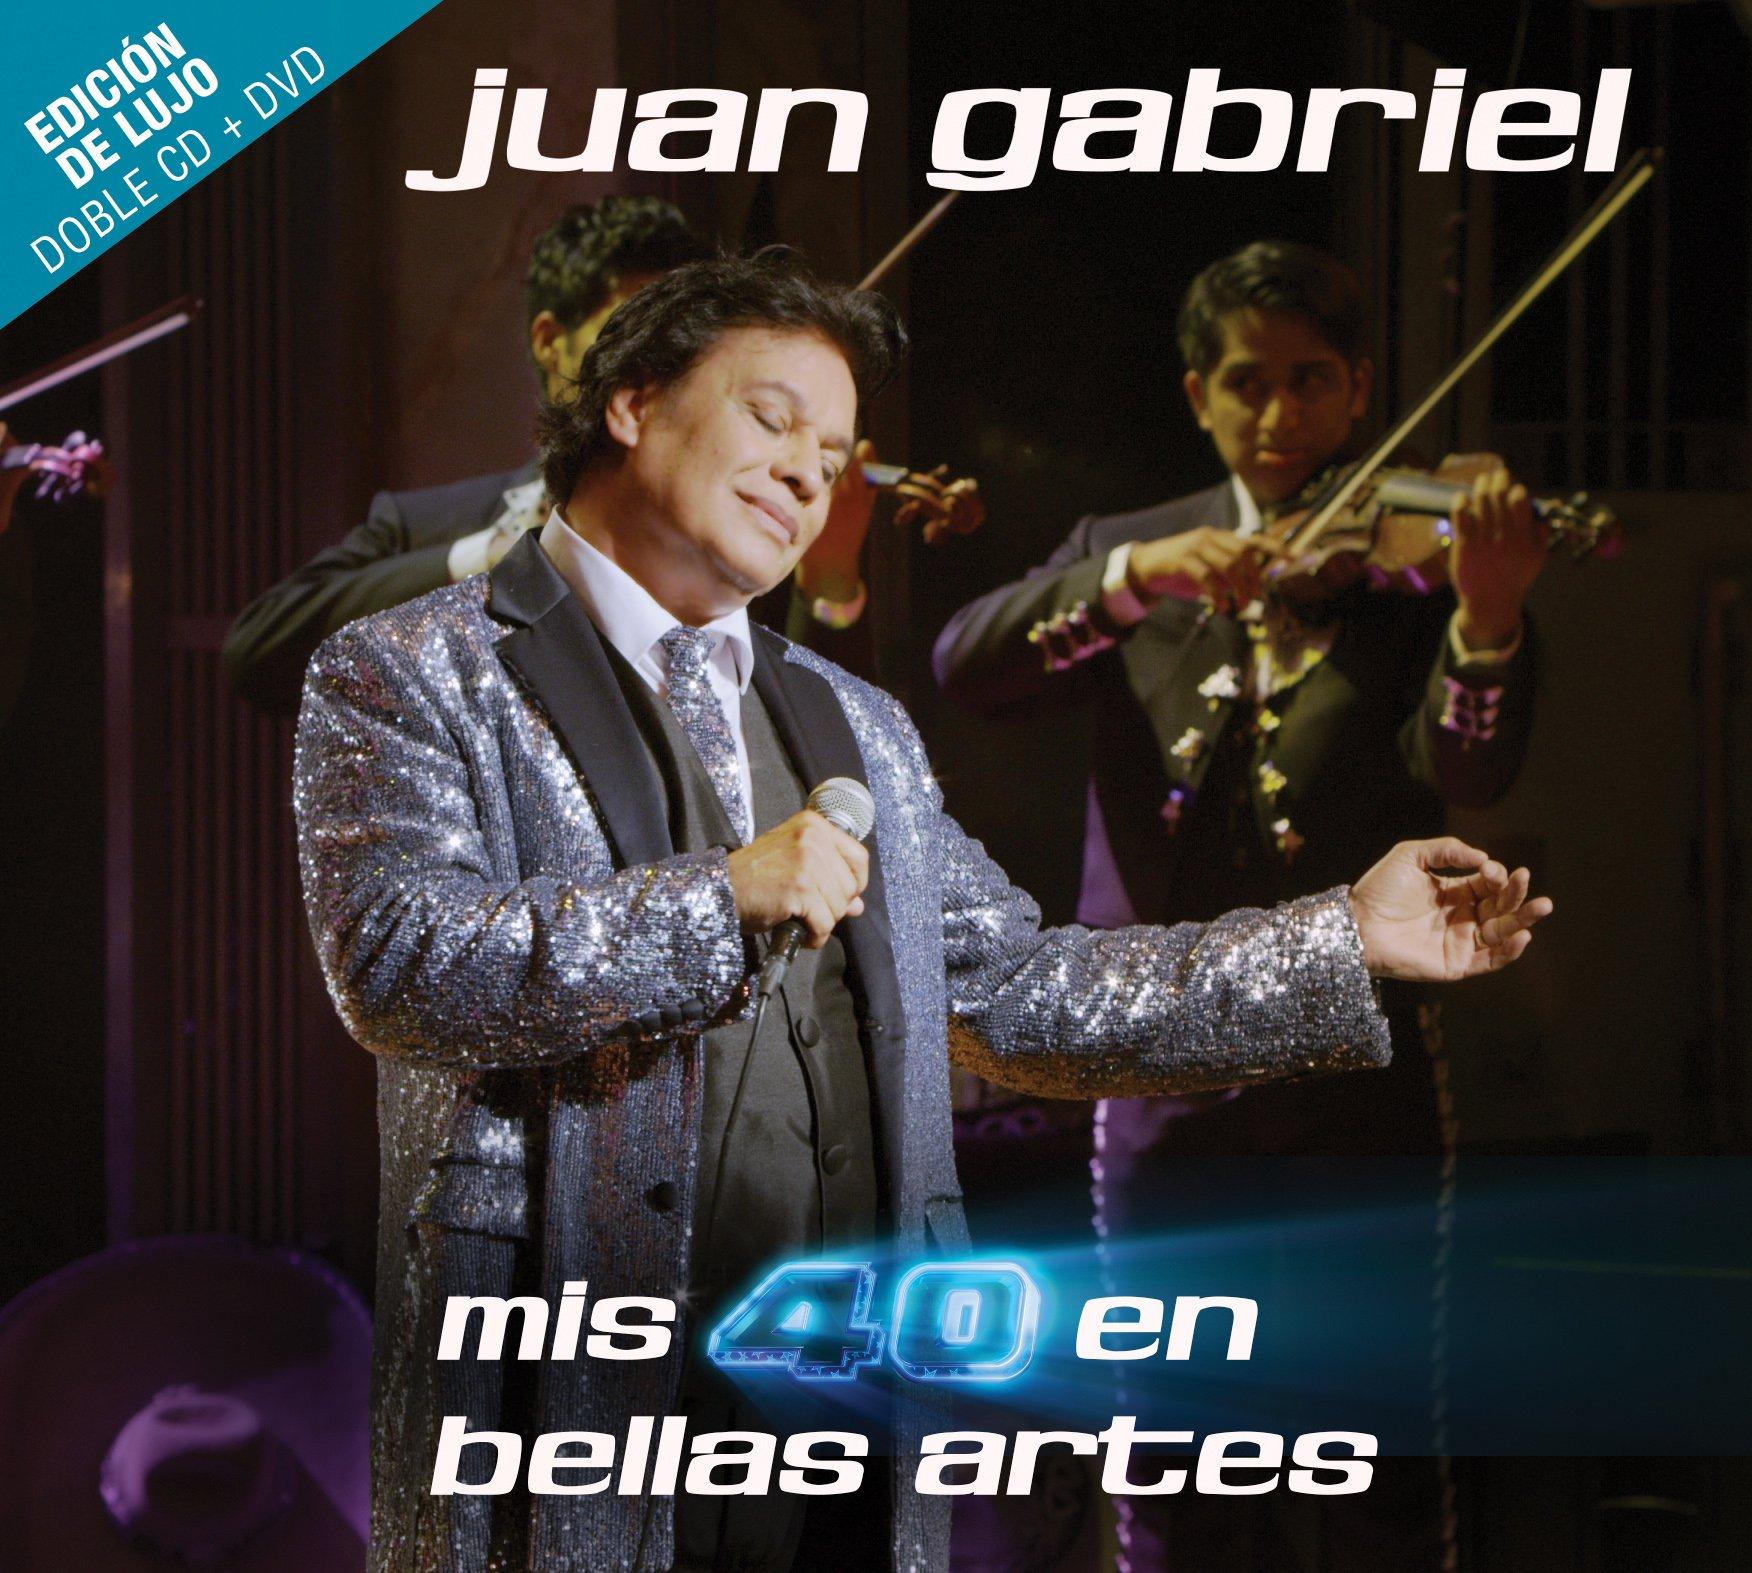 CD : Juan Gabriel - Mis 40 En Bellas Artes [Deluxe Edition] [2CD/ 1DVD] (With DVD, Deluxe Edition, 3 Disc)